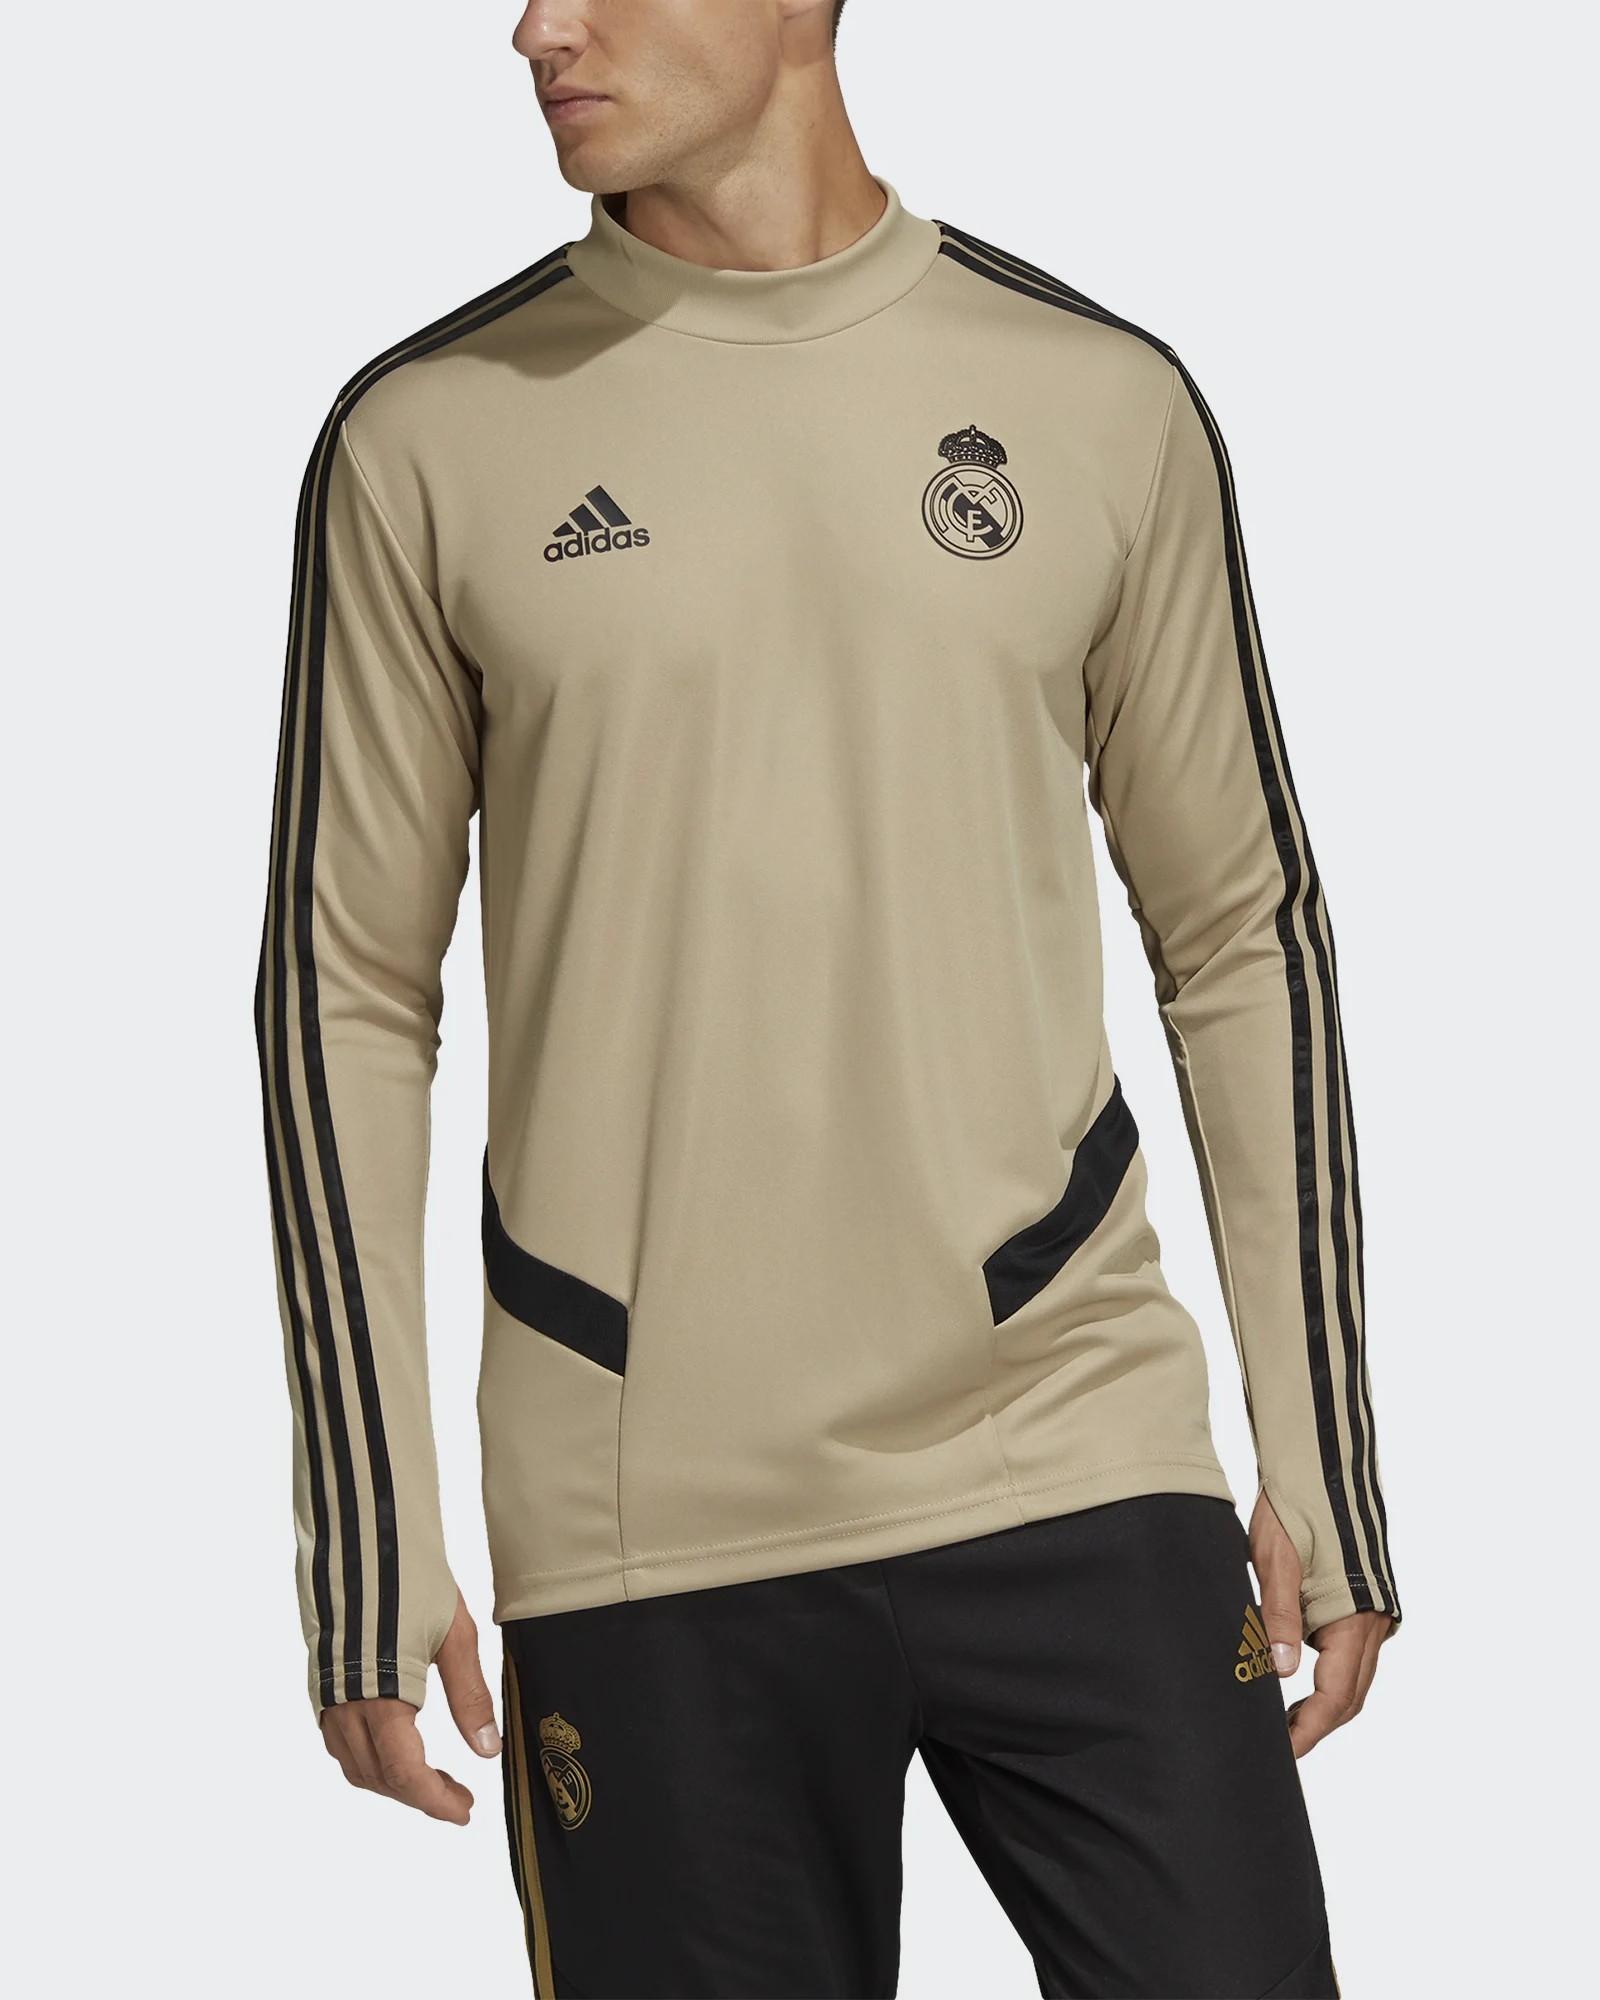 Real Madrid Adidas Felpa Allenamento Training Sweatshirt 2020 Beige Uomo 0